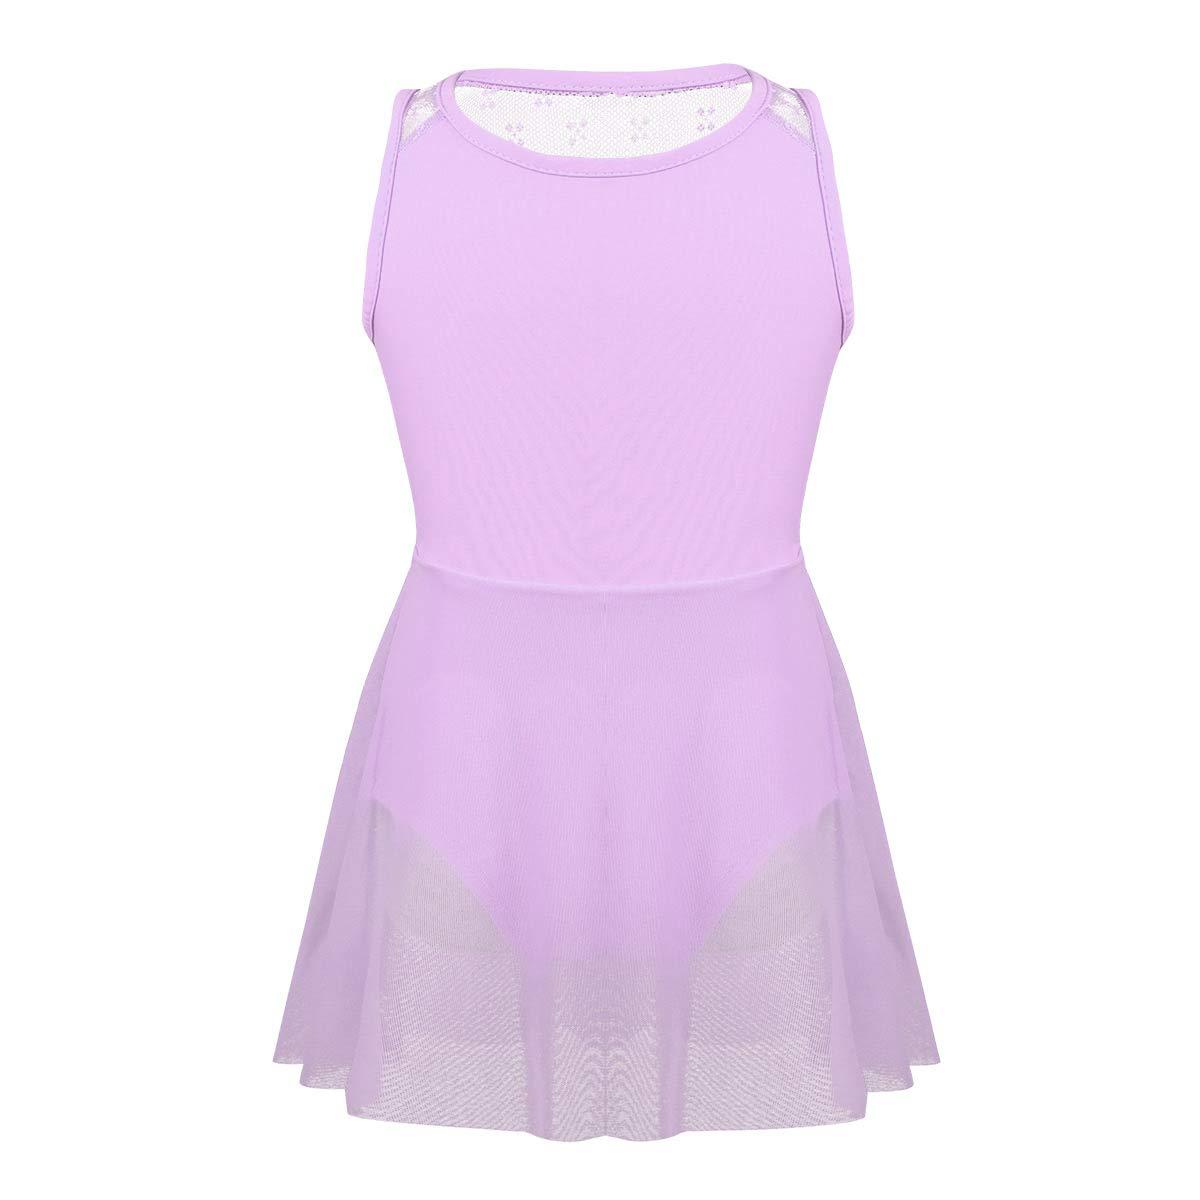 b480e7e84219 iiniim Girls Kids Lyrical Latin Ballet Dance Tutu Dress Glitter Ballerina  Gymnastic Leotard Skirt Fairy Costume: Amazon.co.uk: Sports & Outdoors